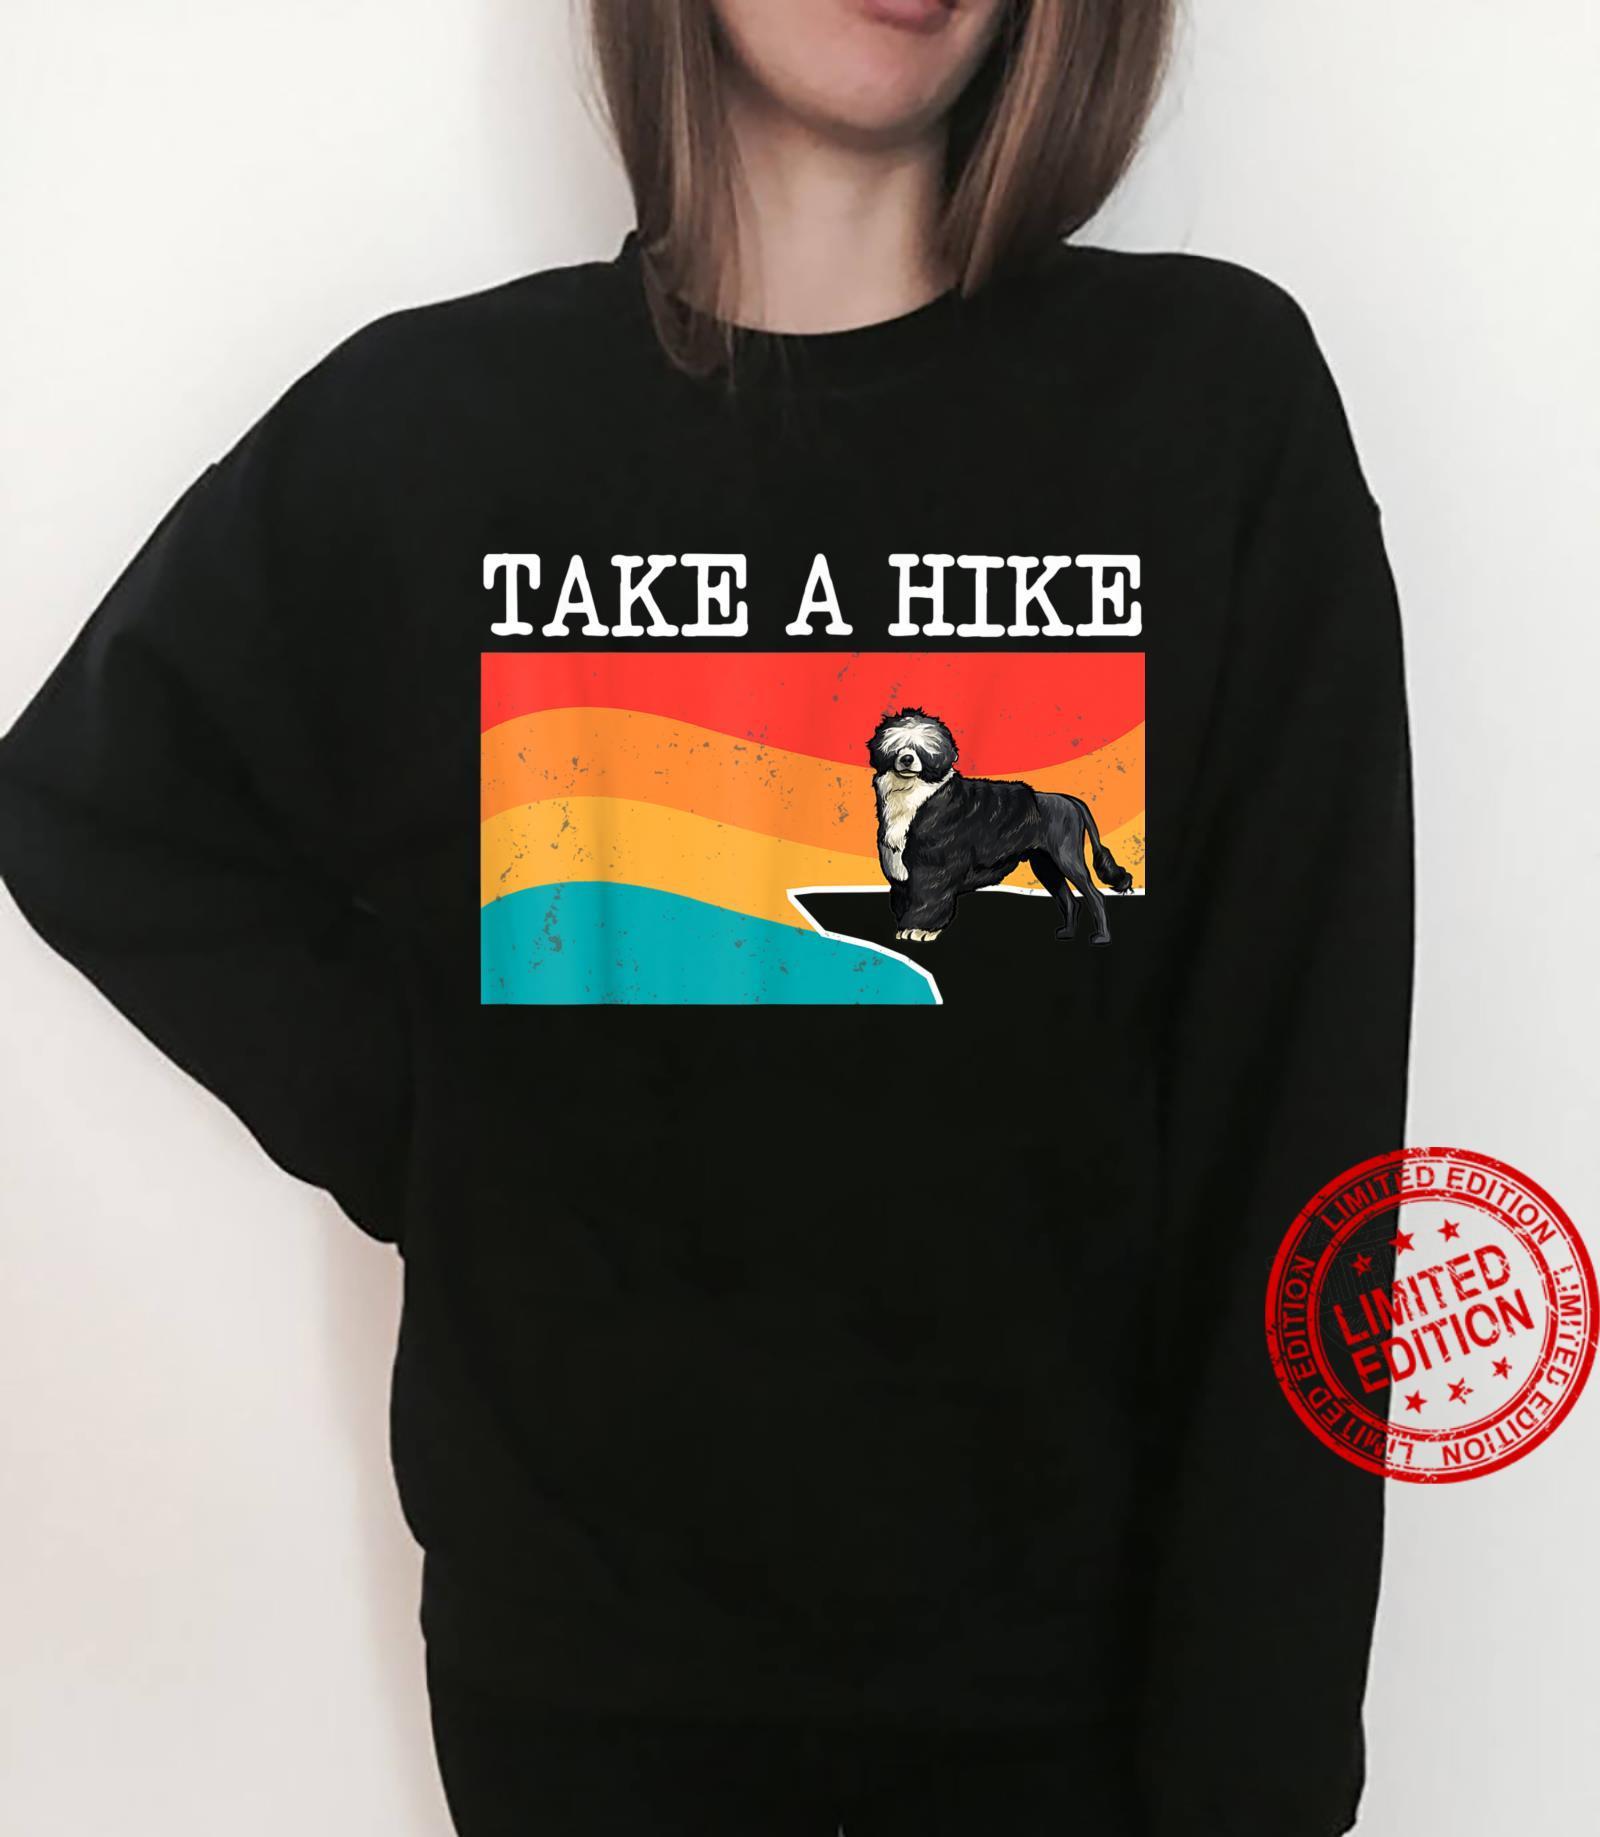 Hiking Shirt sweater